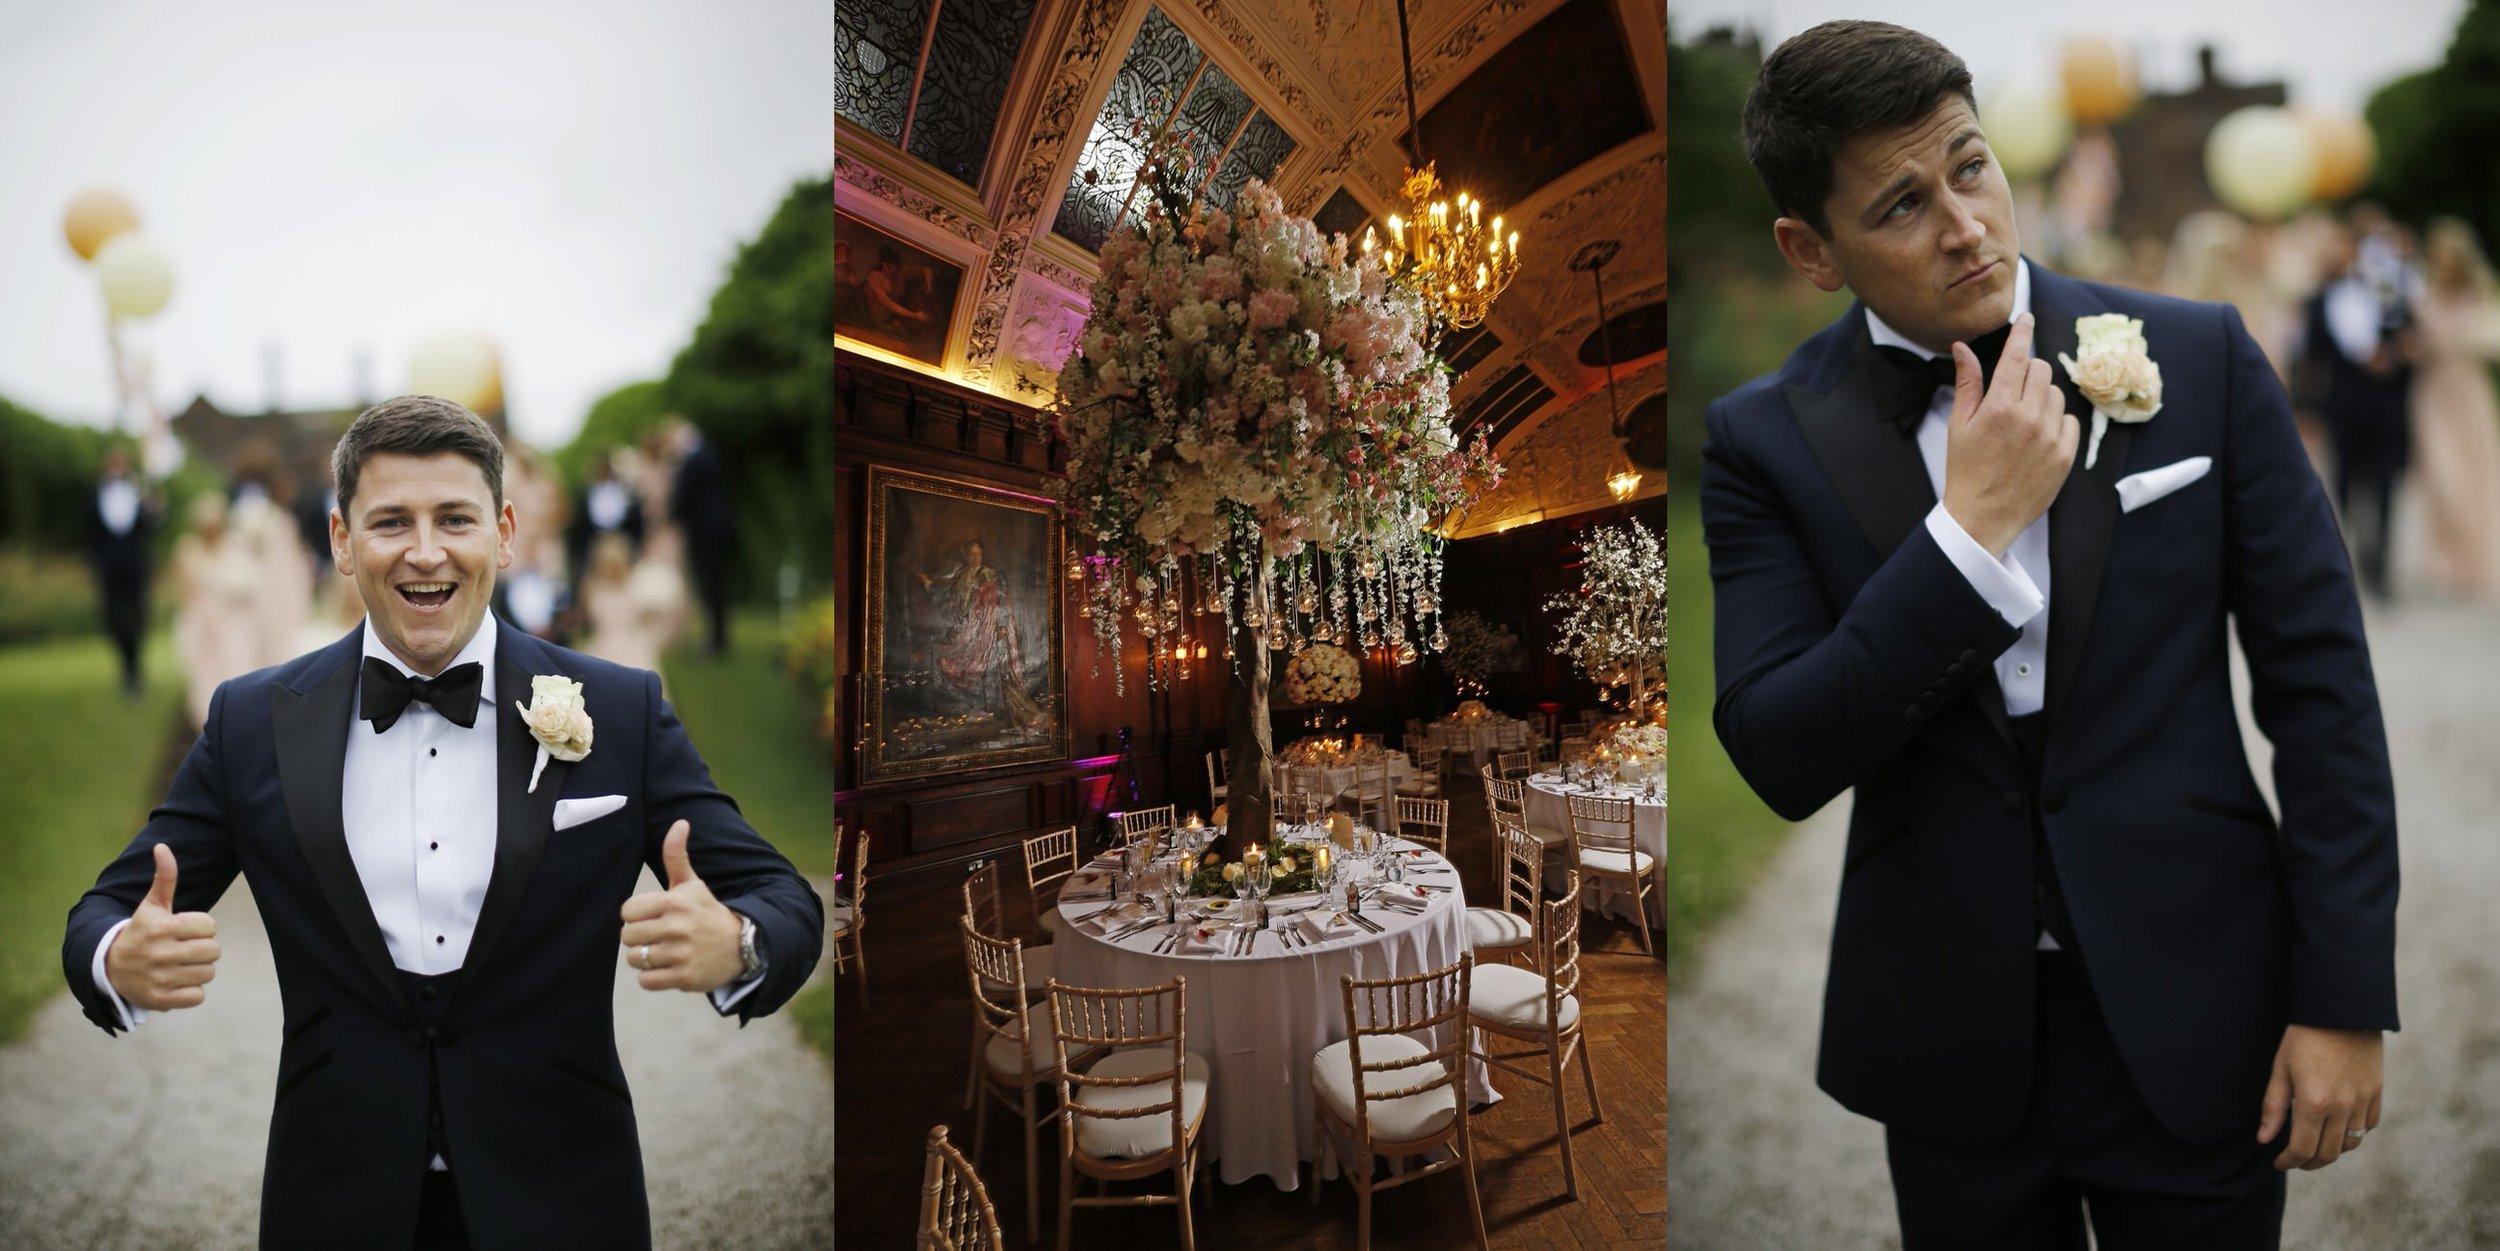 cheshire-wedding-photographer-thornton-manor-weddings_0016.jpg